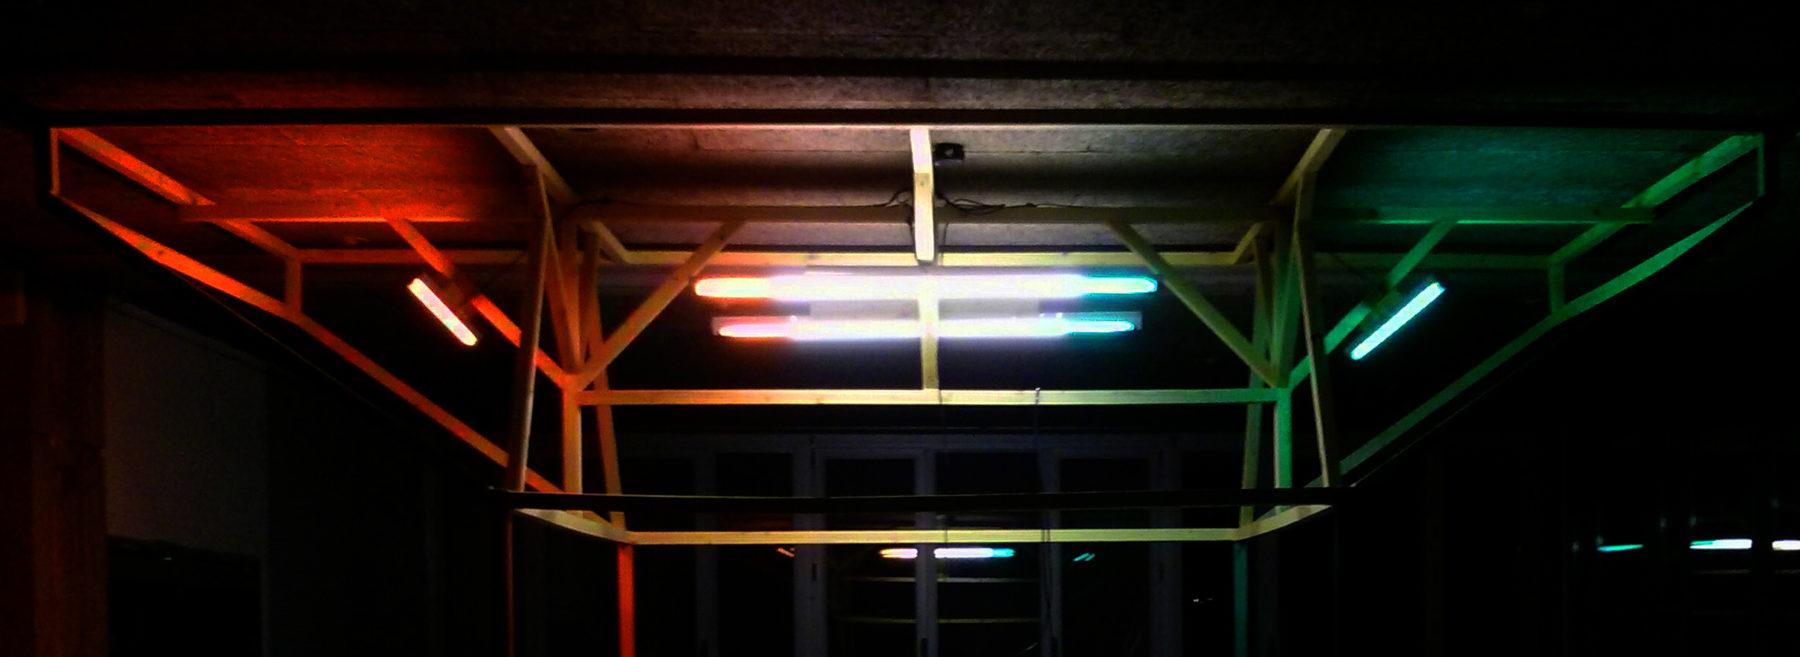 www.bold-design.fr - Bar éphémère Barcade - bold + BriceMG - photo bold-design